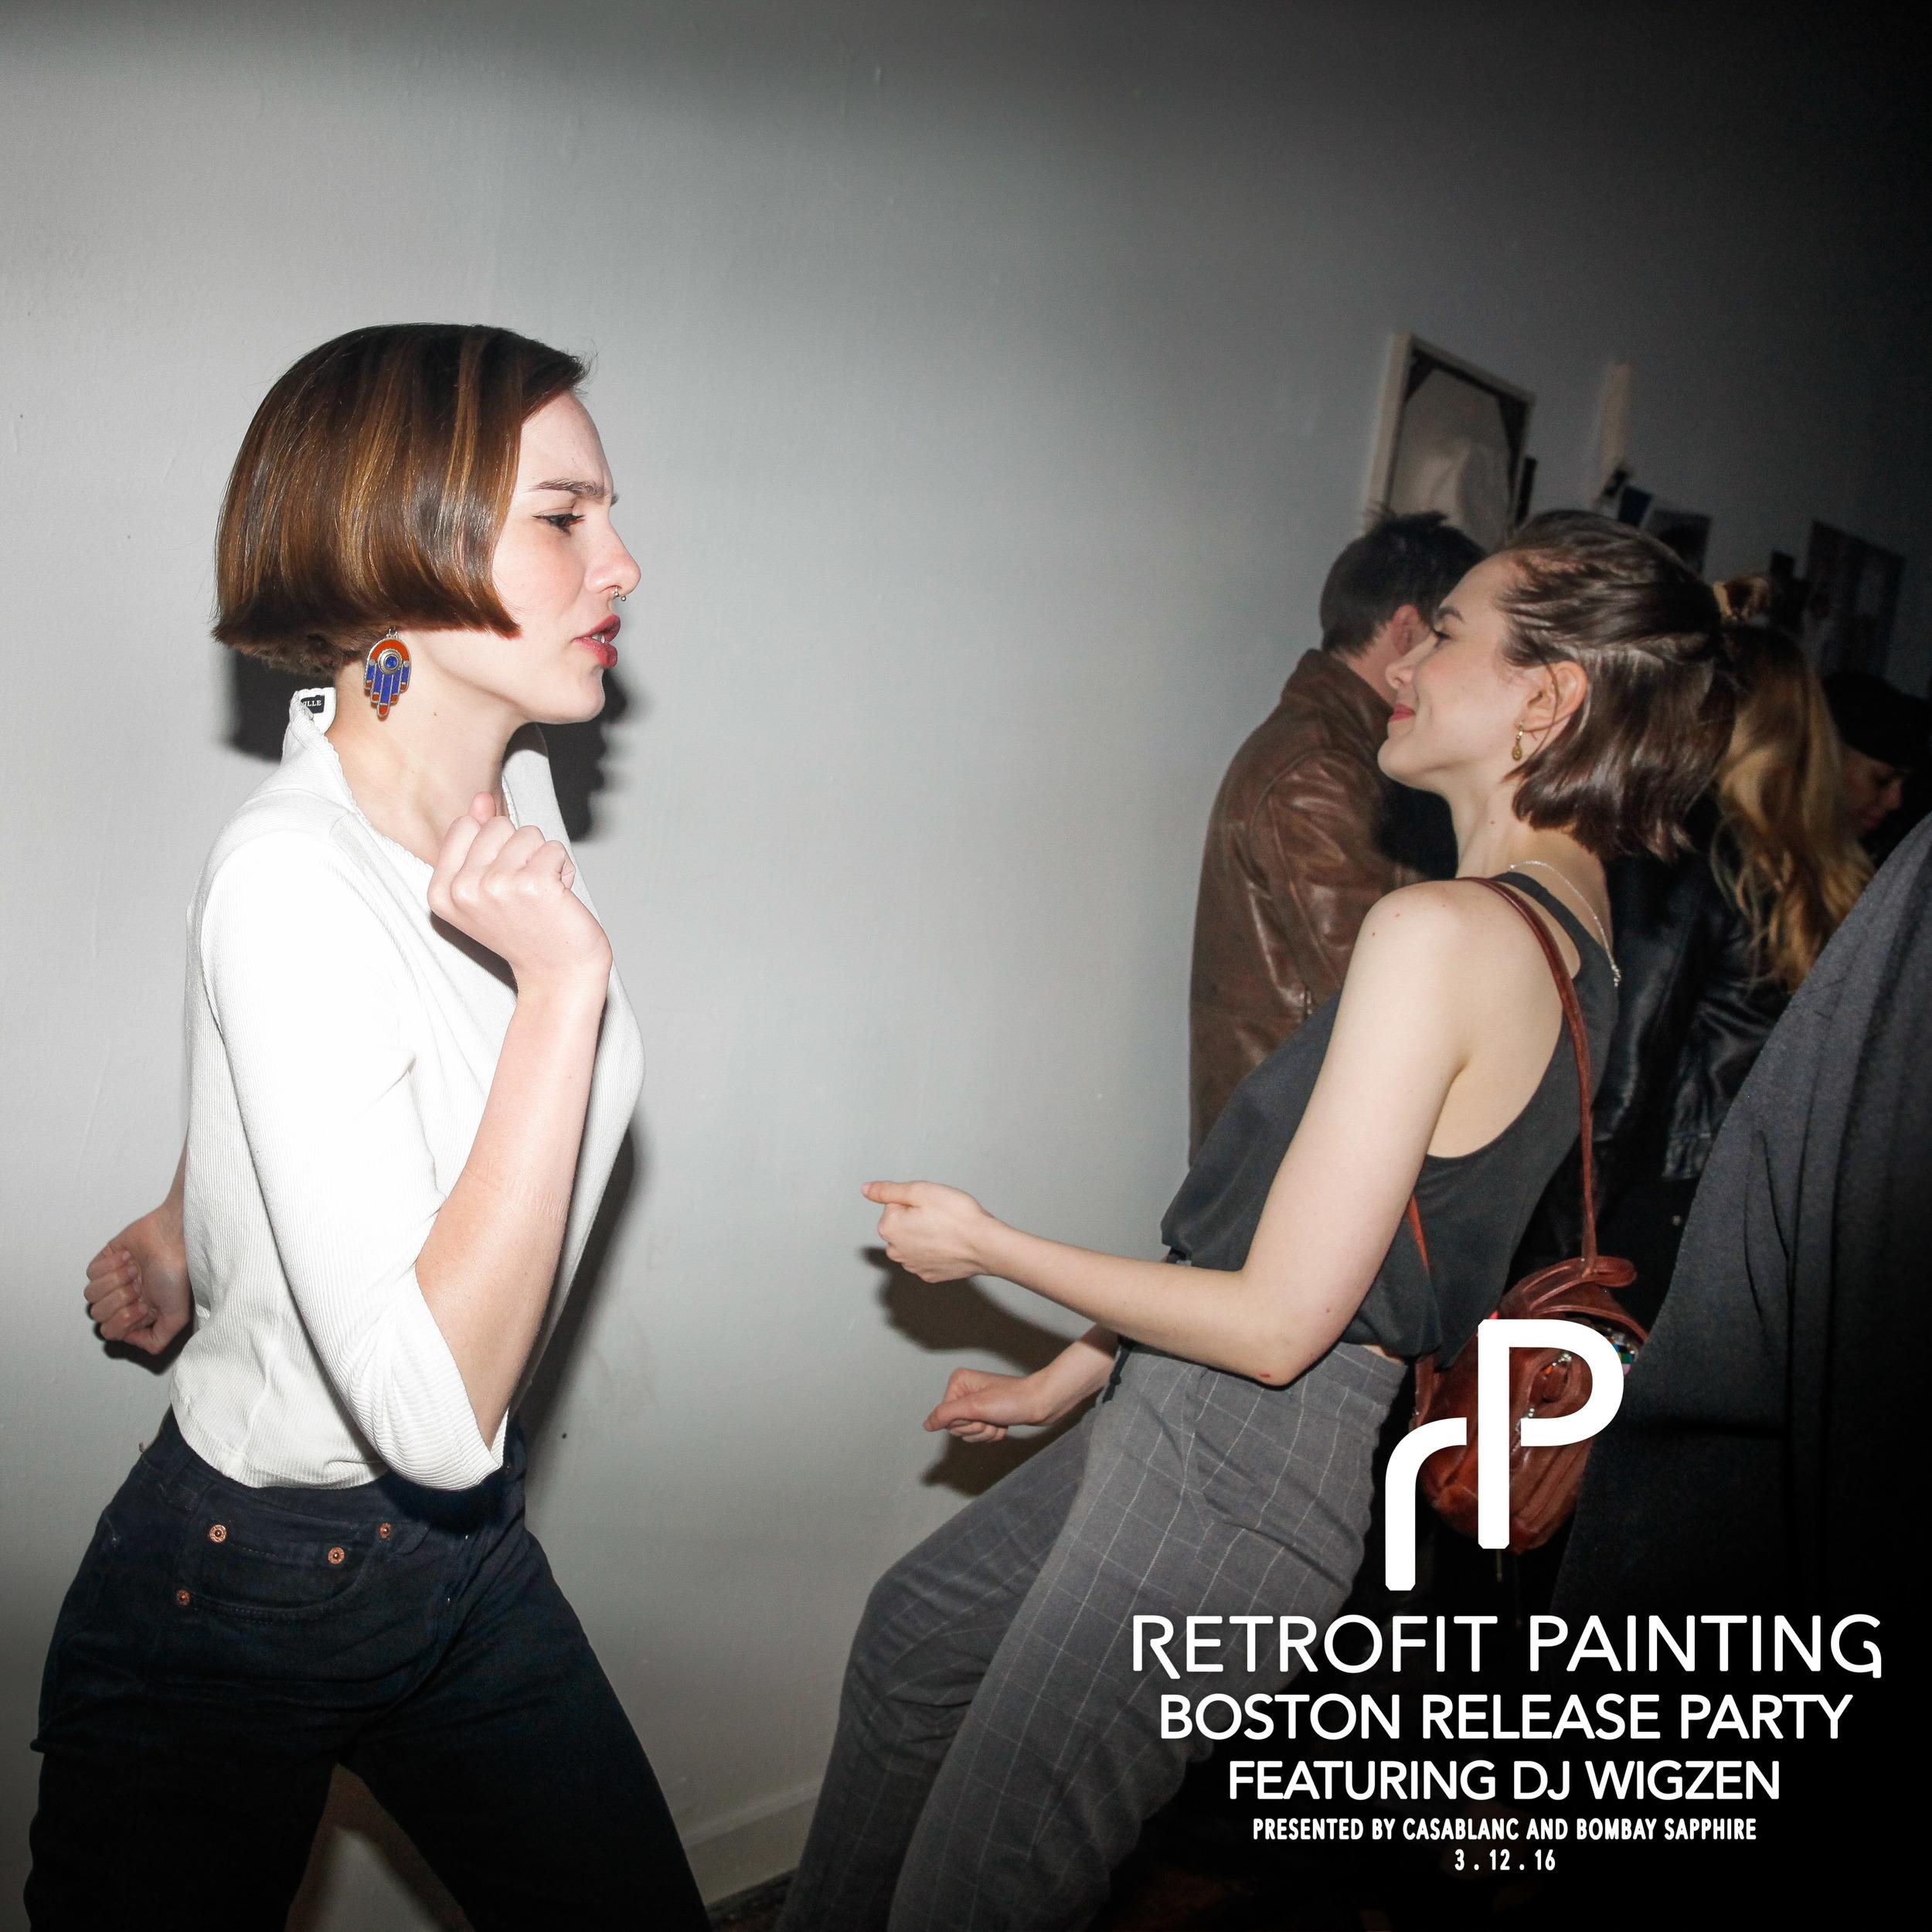 Retrofit Painting Boston Release Party 0131.jpg